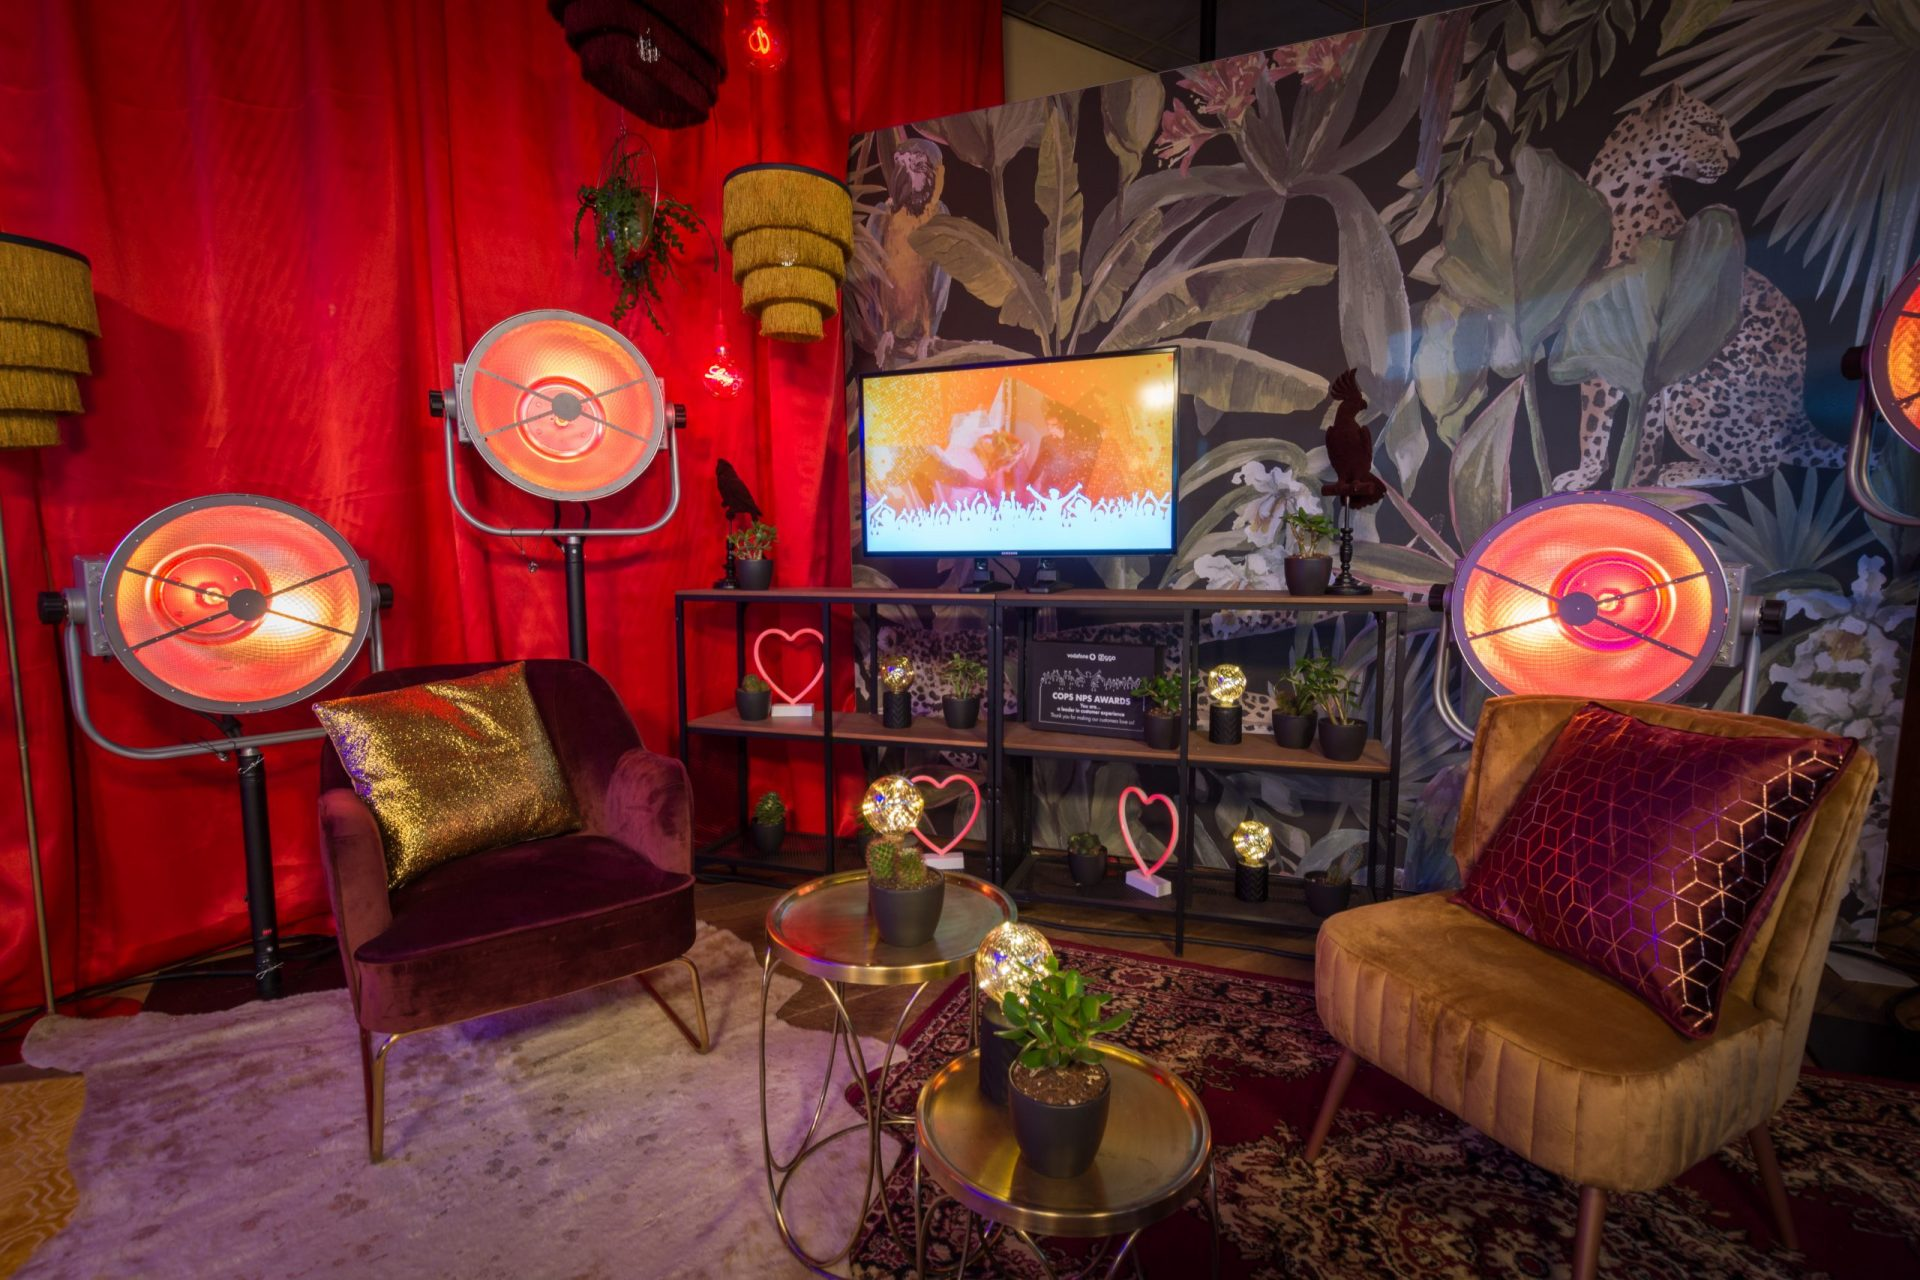 Hazes in Studio A2 Cafe Breukelen (3)